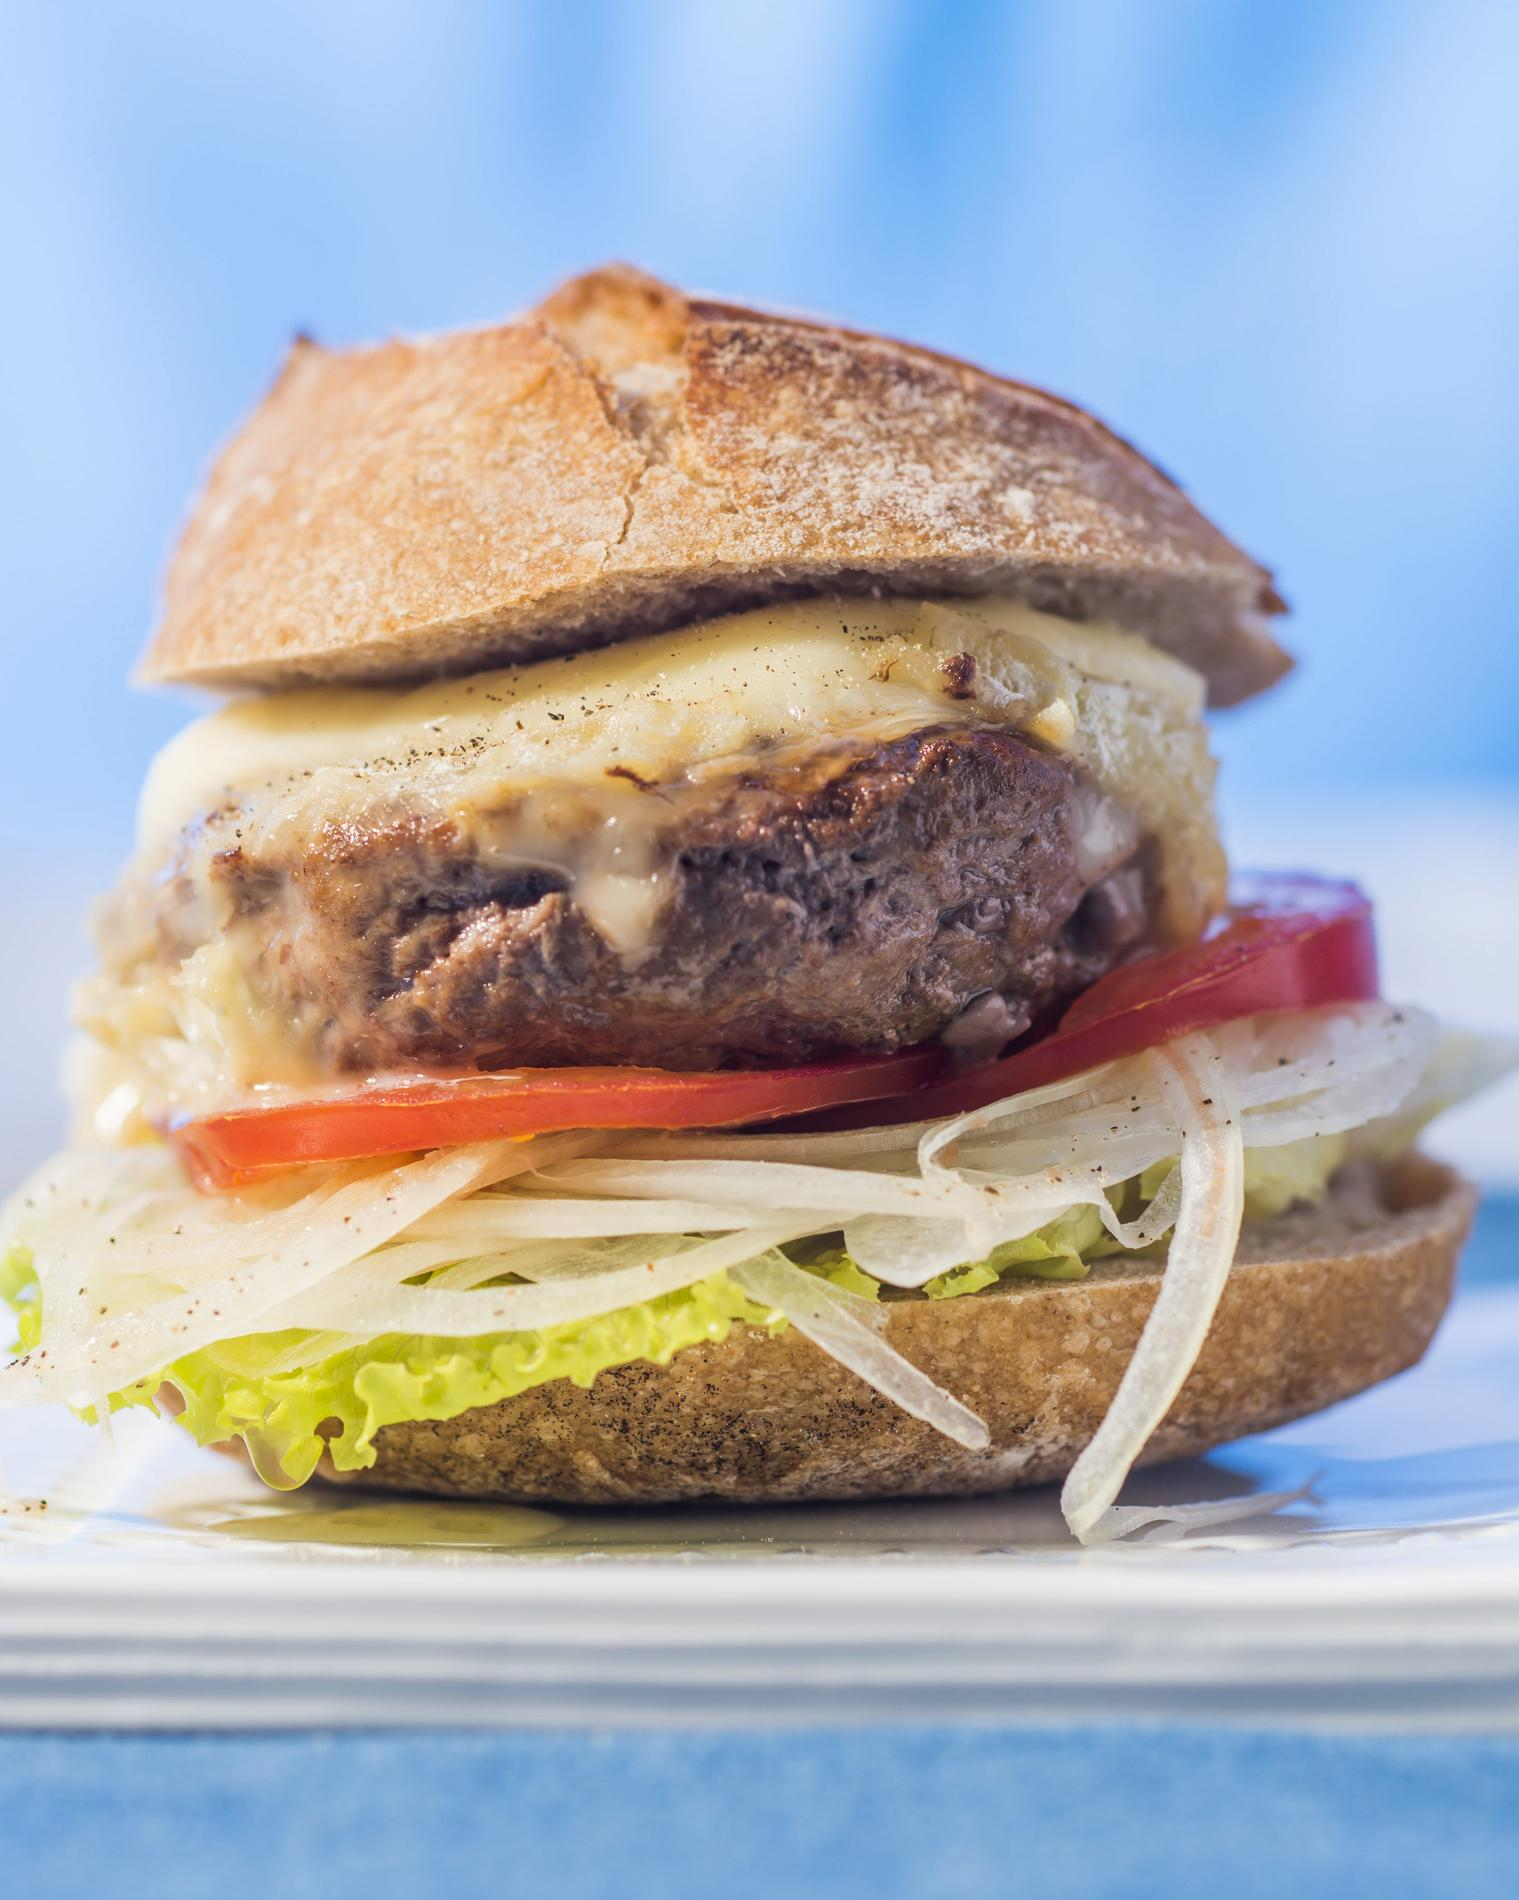 recette burger au crottin de chavignol cuisine madame figaro. Black Bedroom Furniture Sets. Home Design Ideas